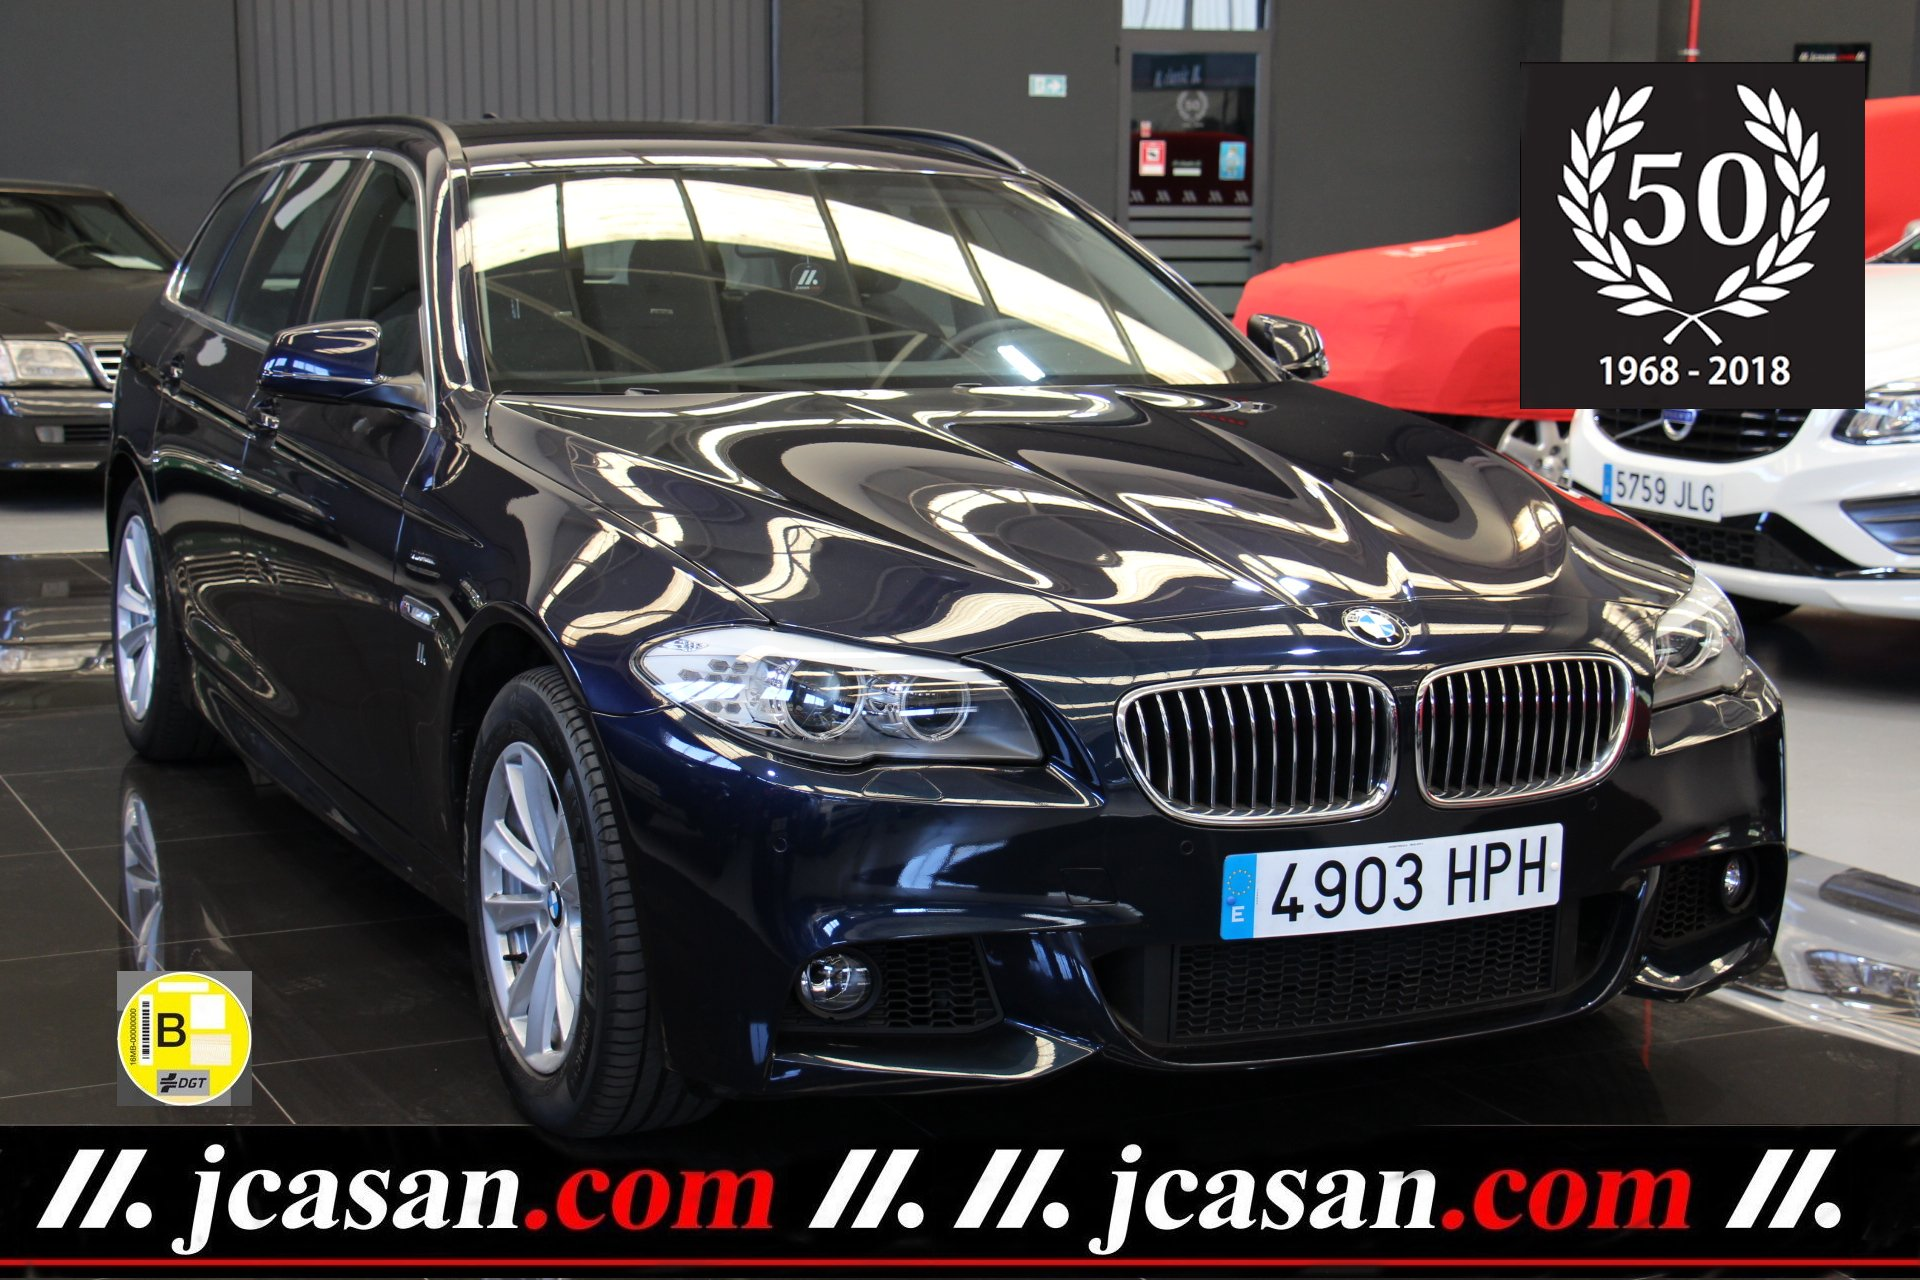 BMW 520d 184 CV TOURING 6 Vel